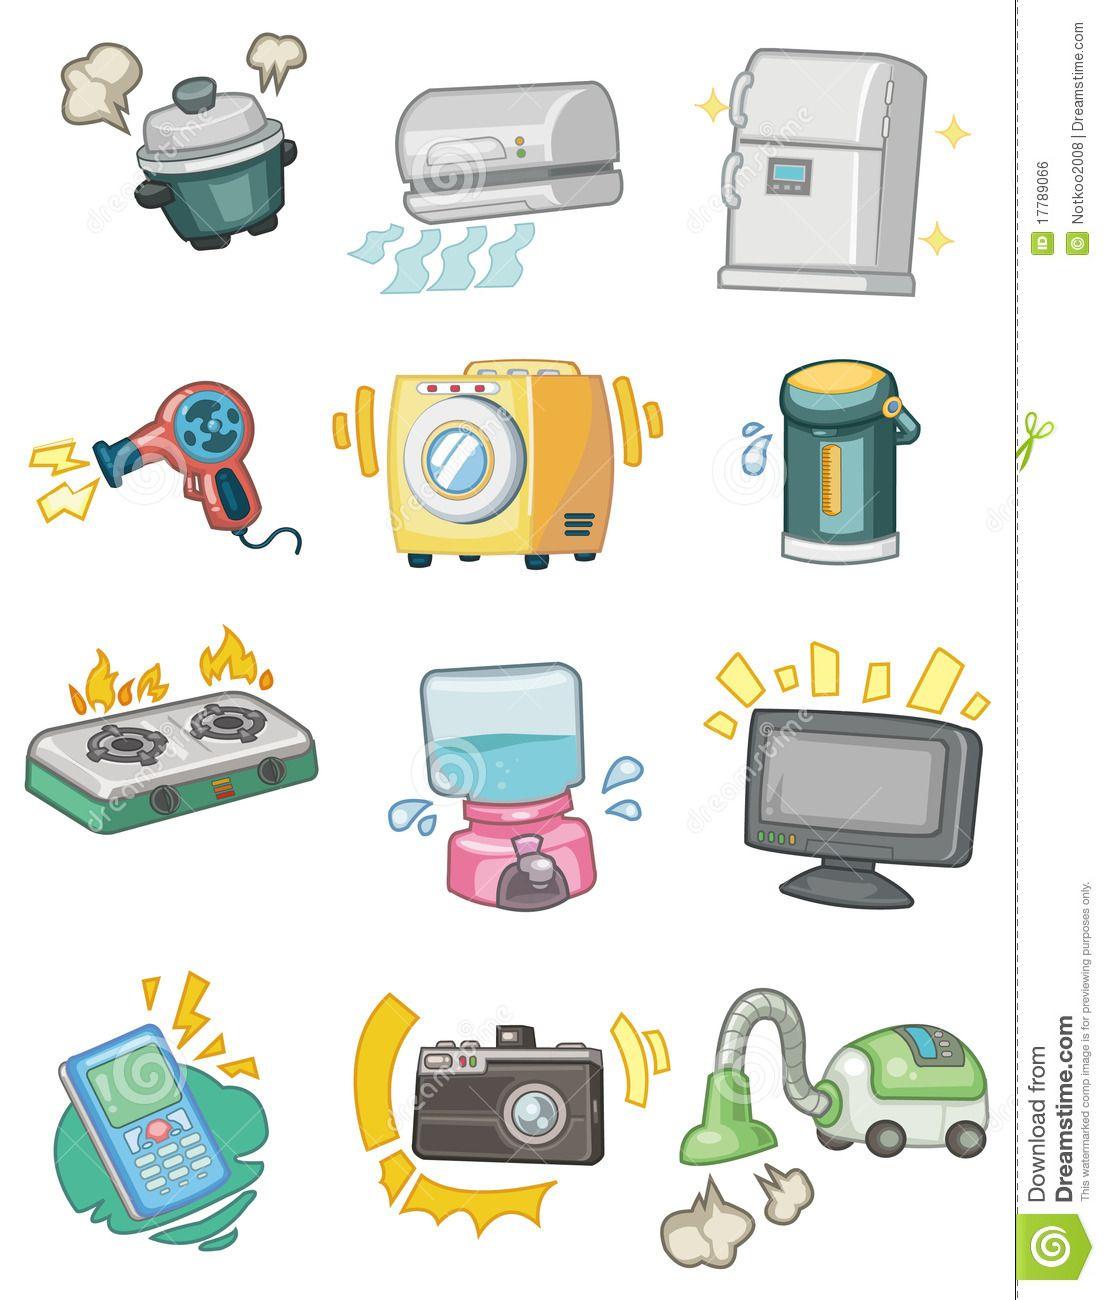 Pin On Appliances